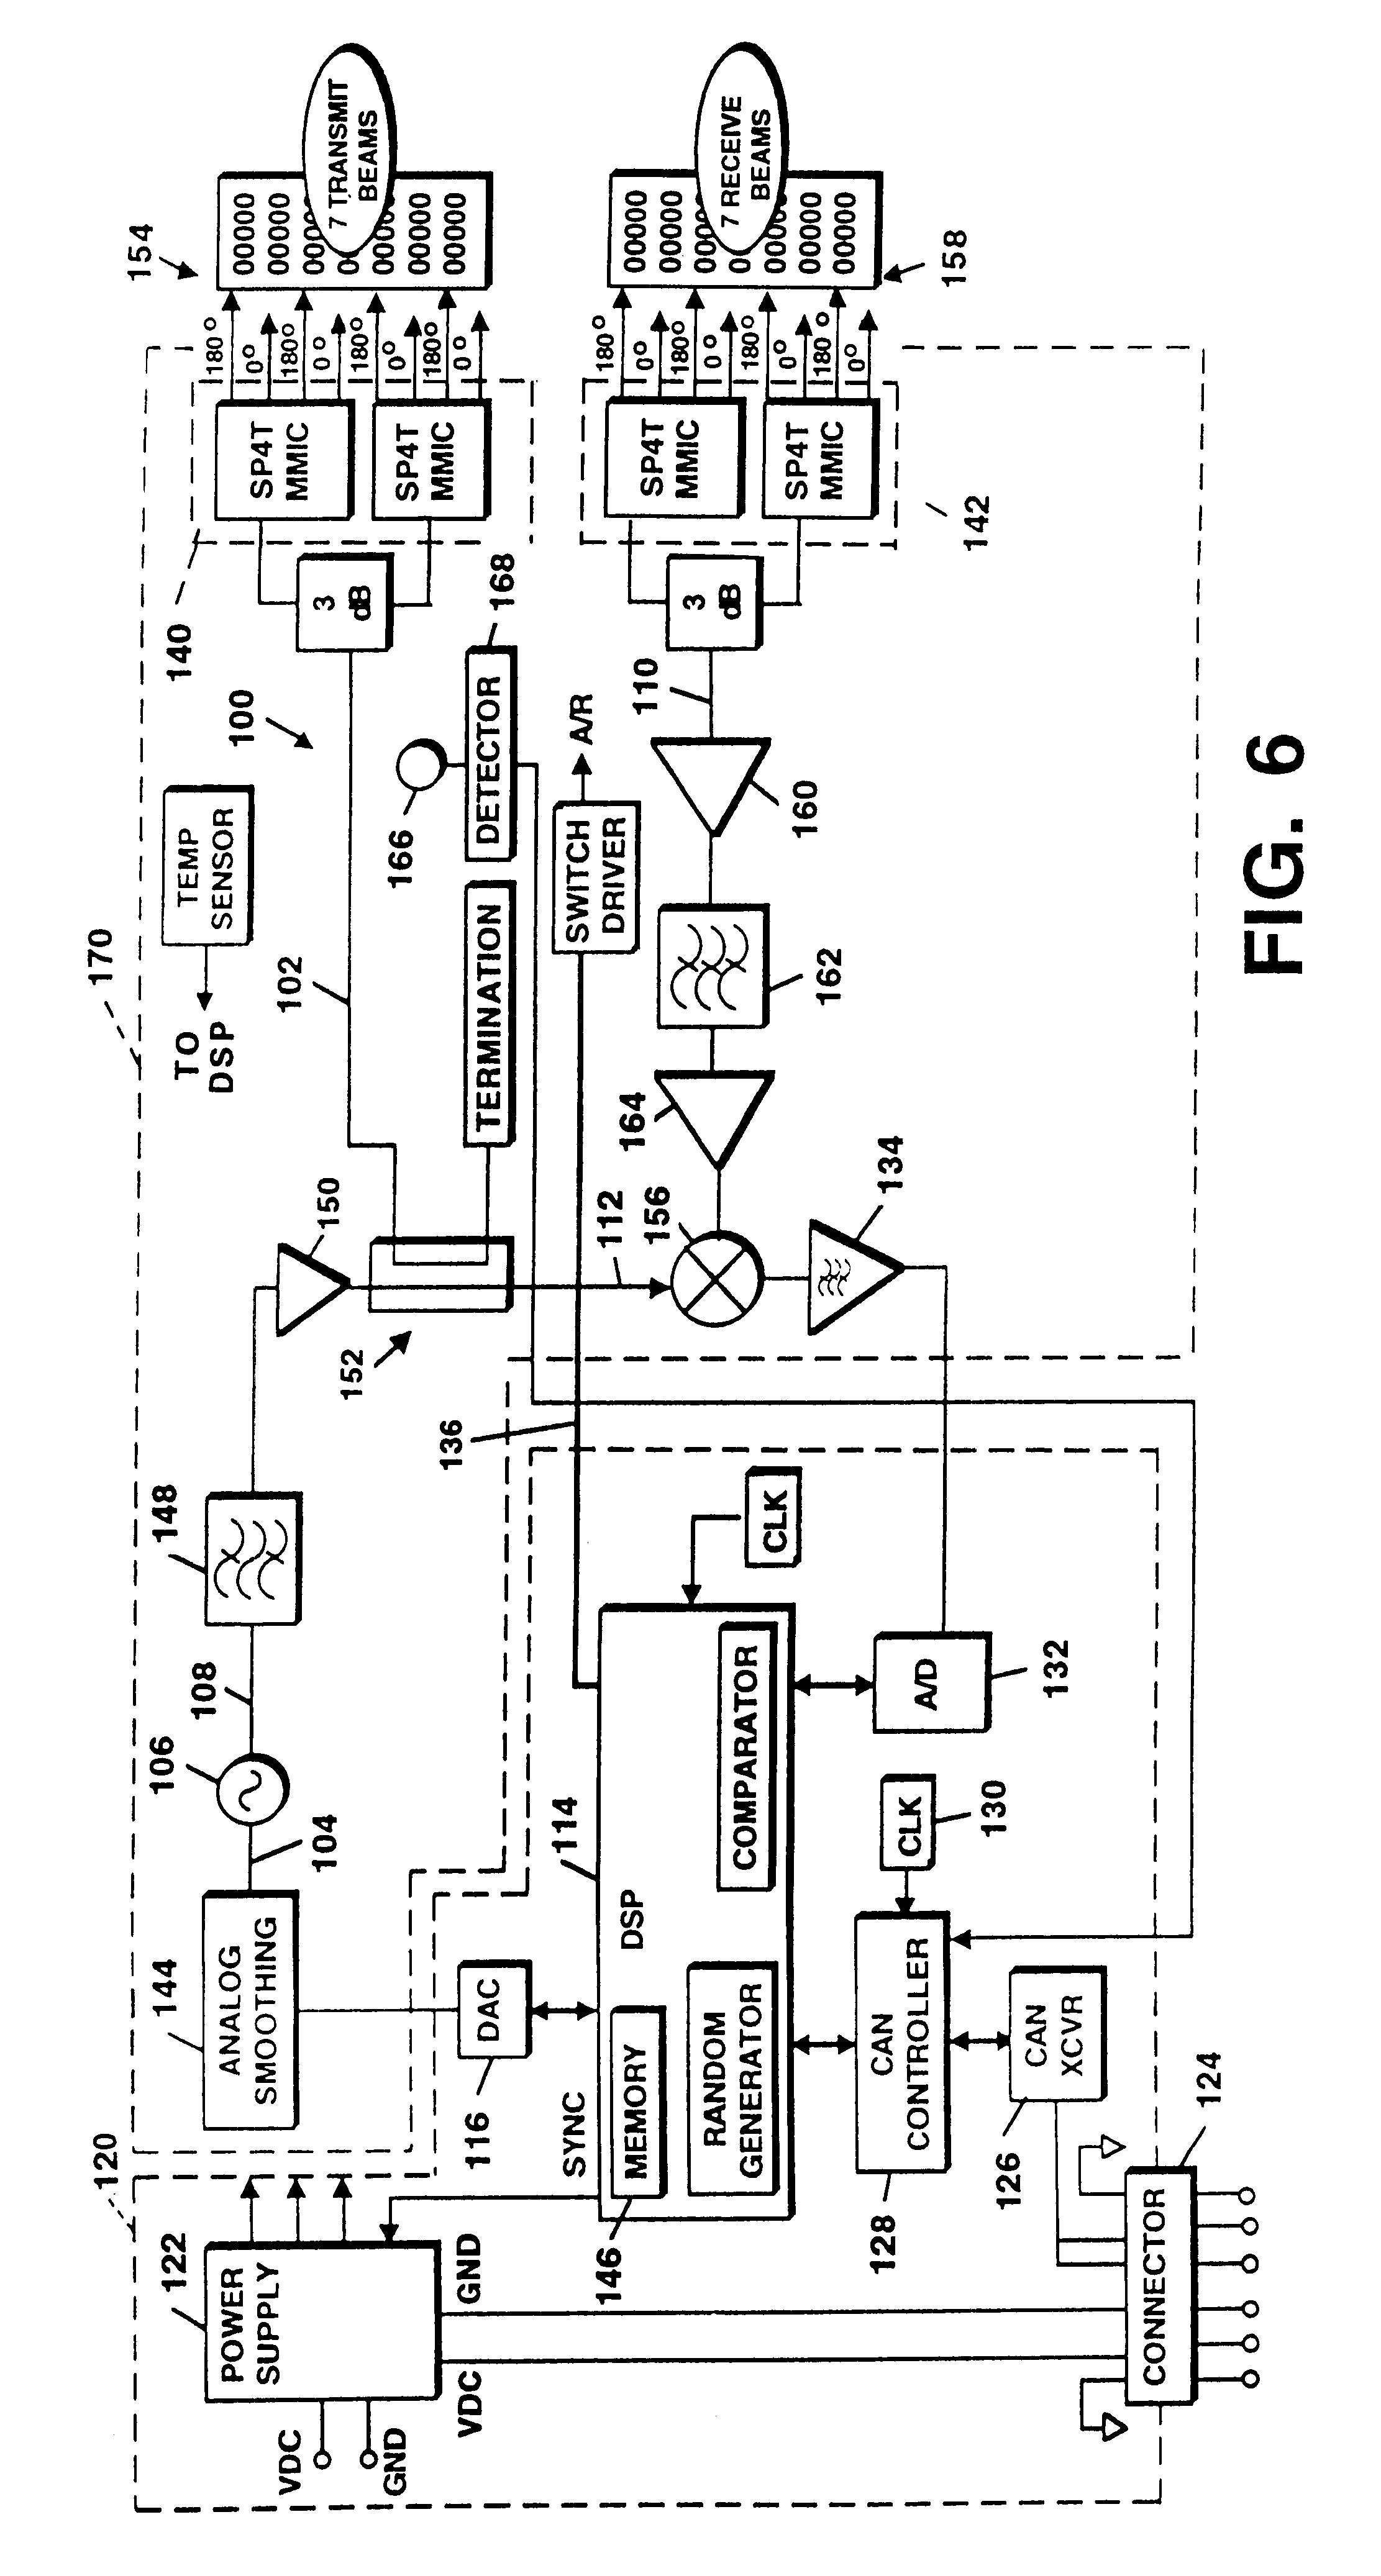 thomas bus electrical diagrams wiring diagrams